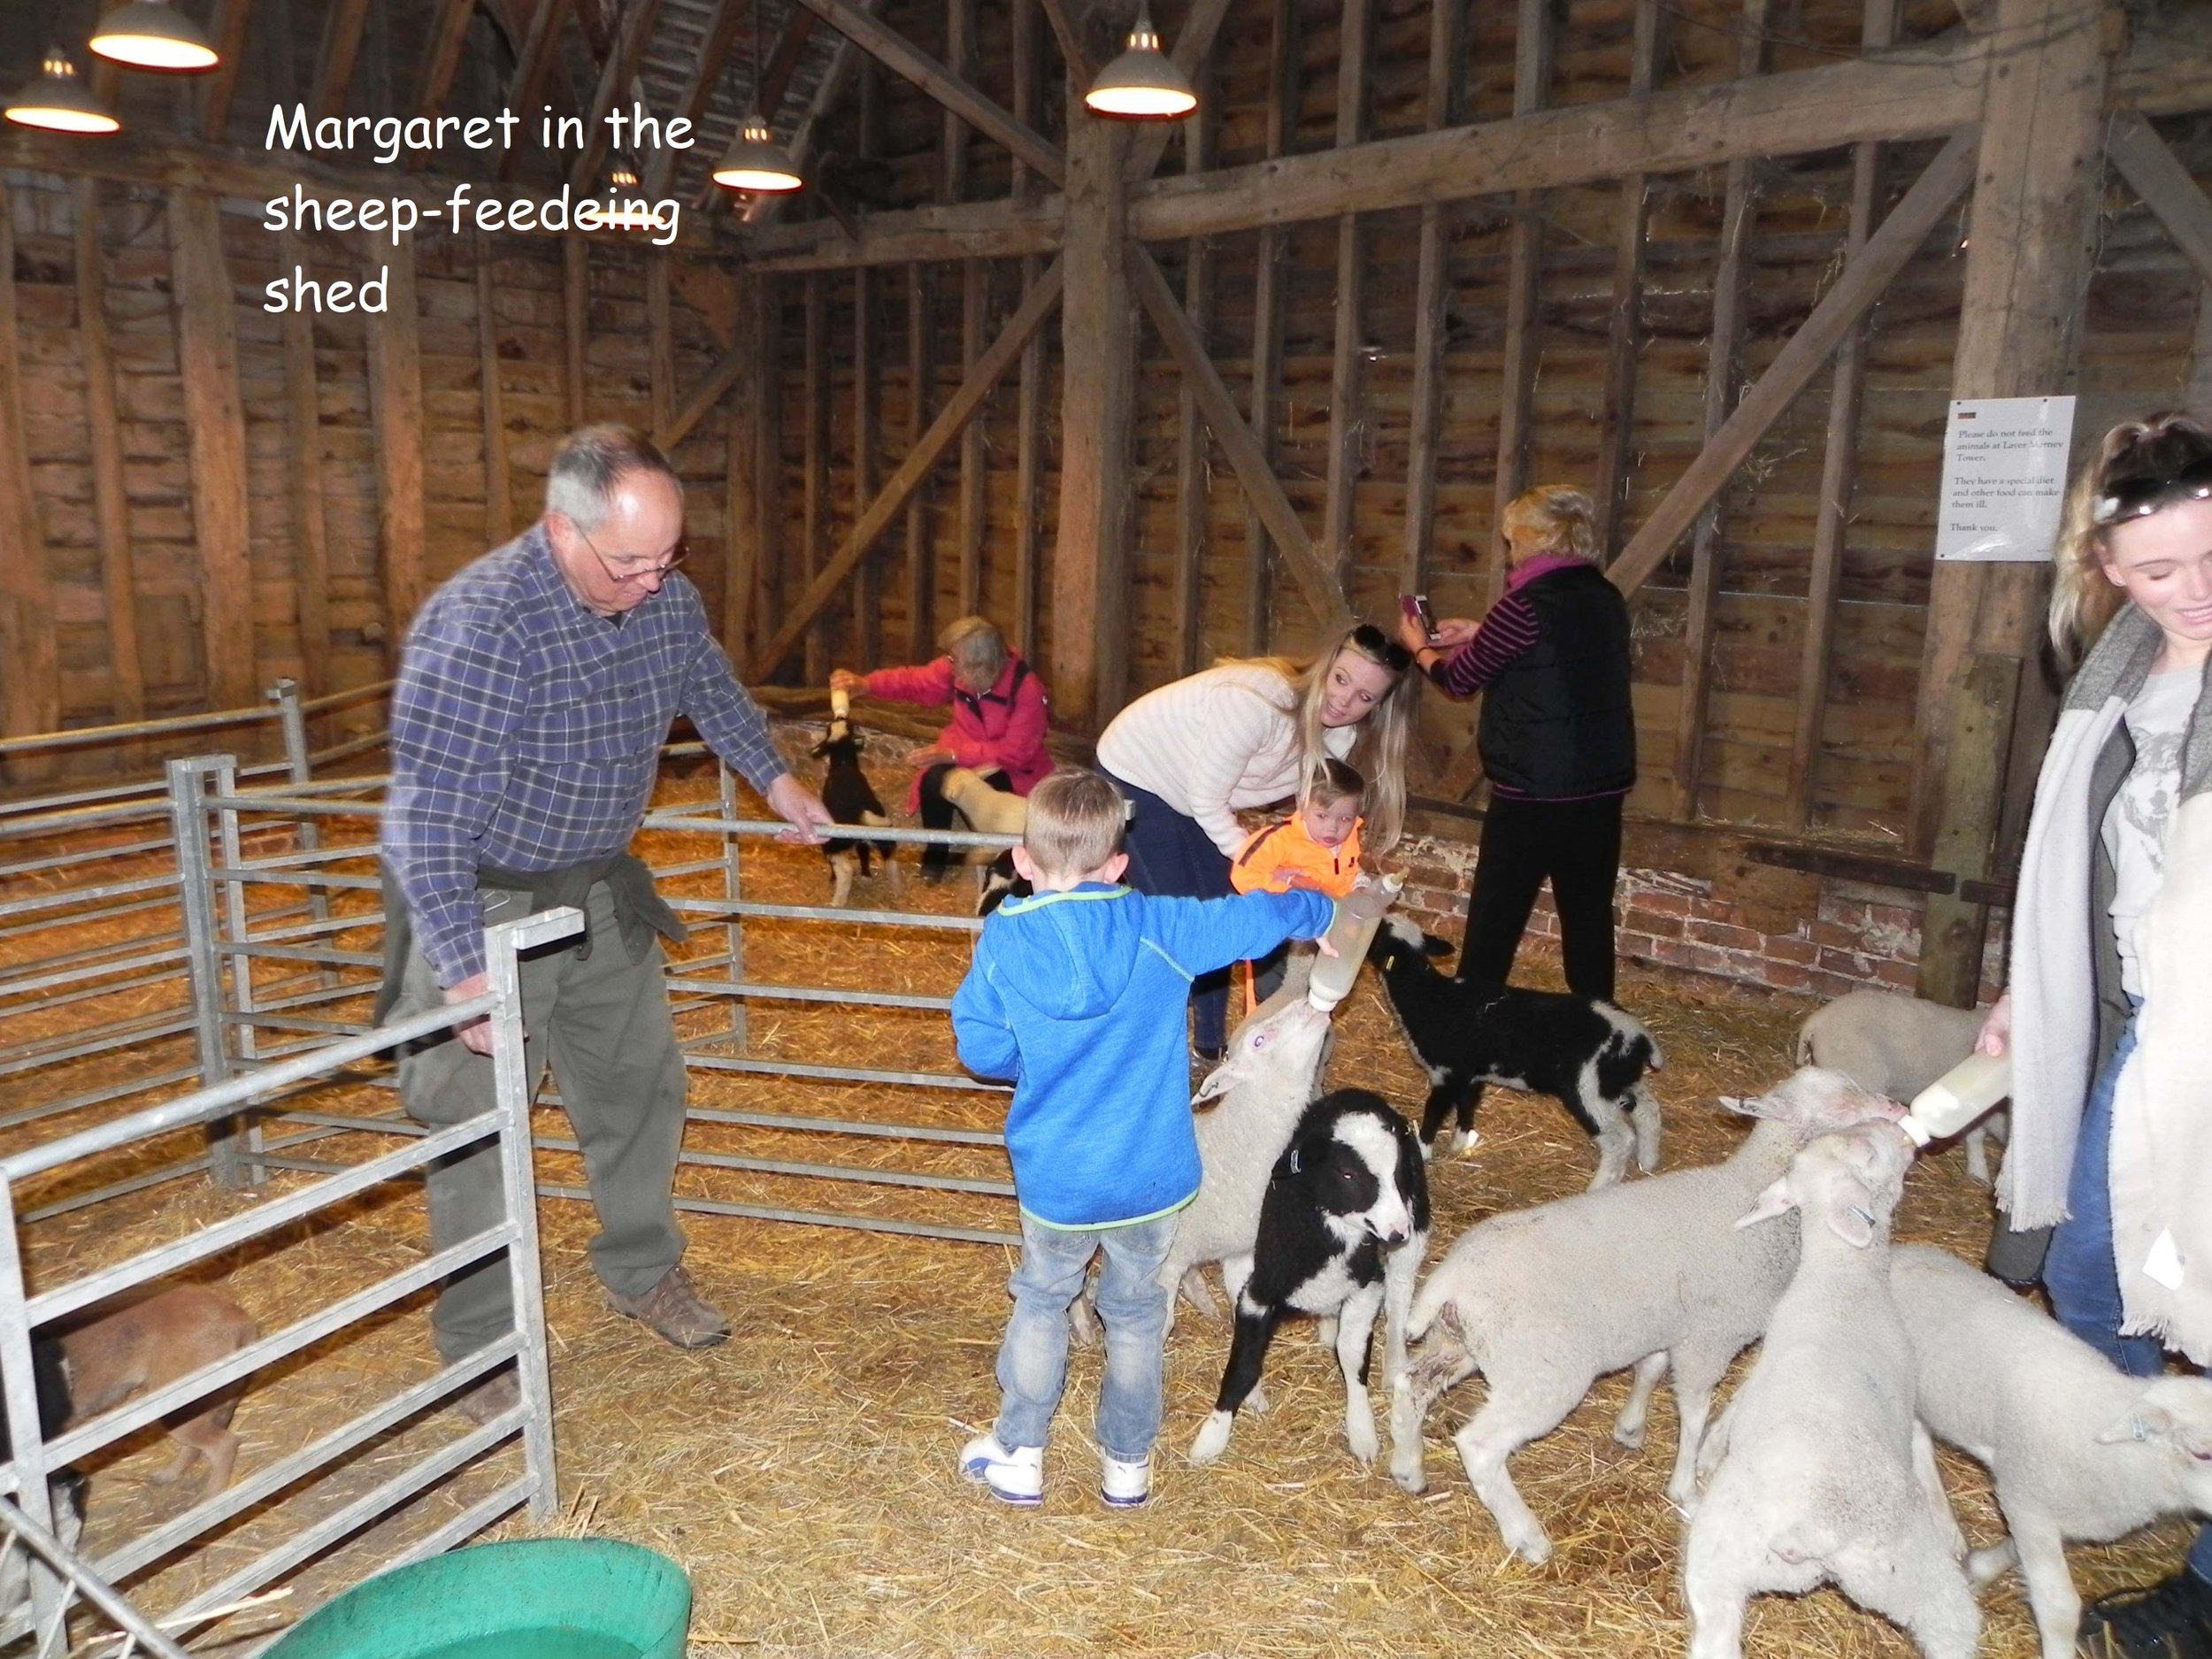 Sheep-feeding shed.jpeg